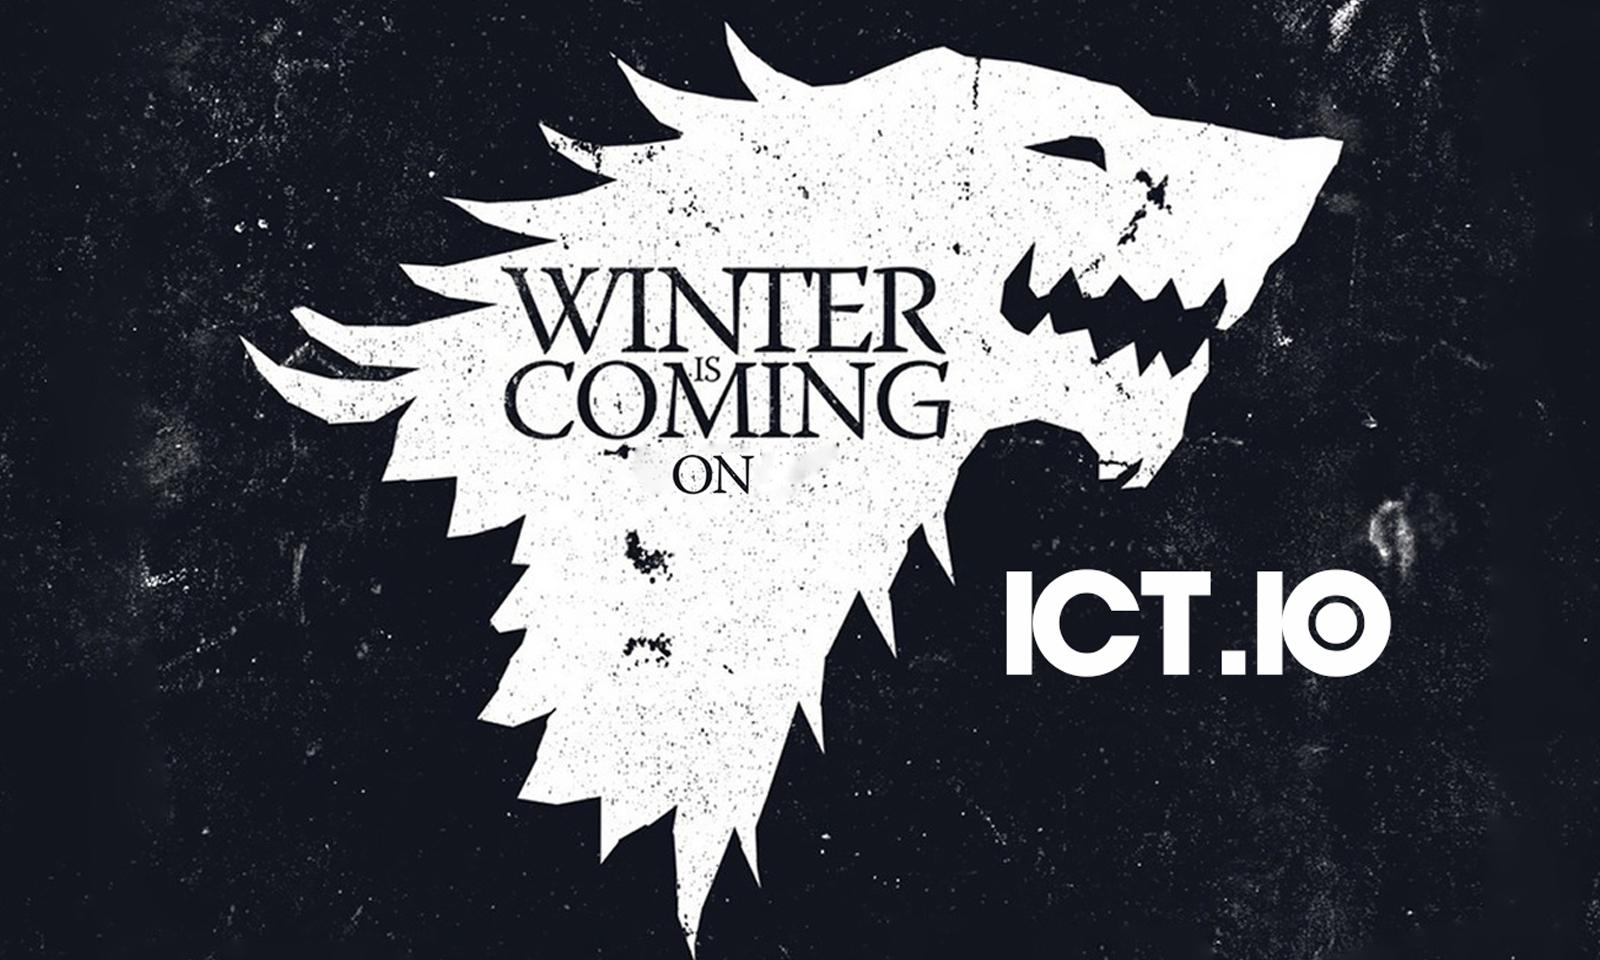 Winter is coming on ict.io